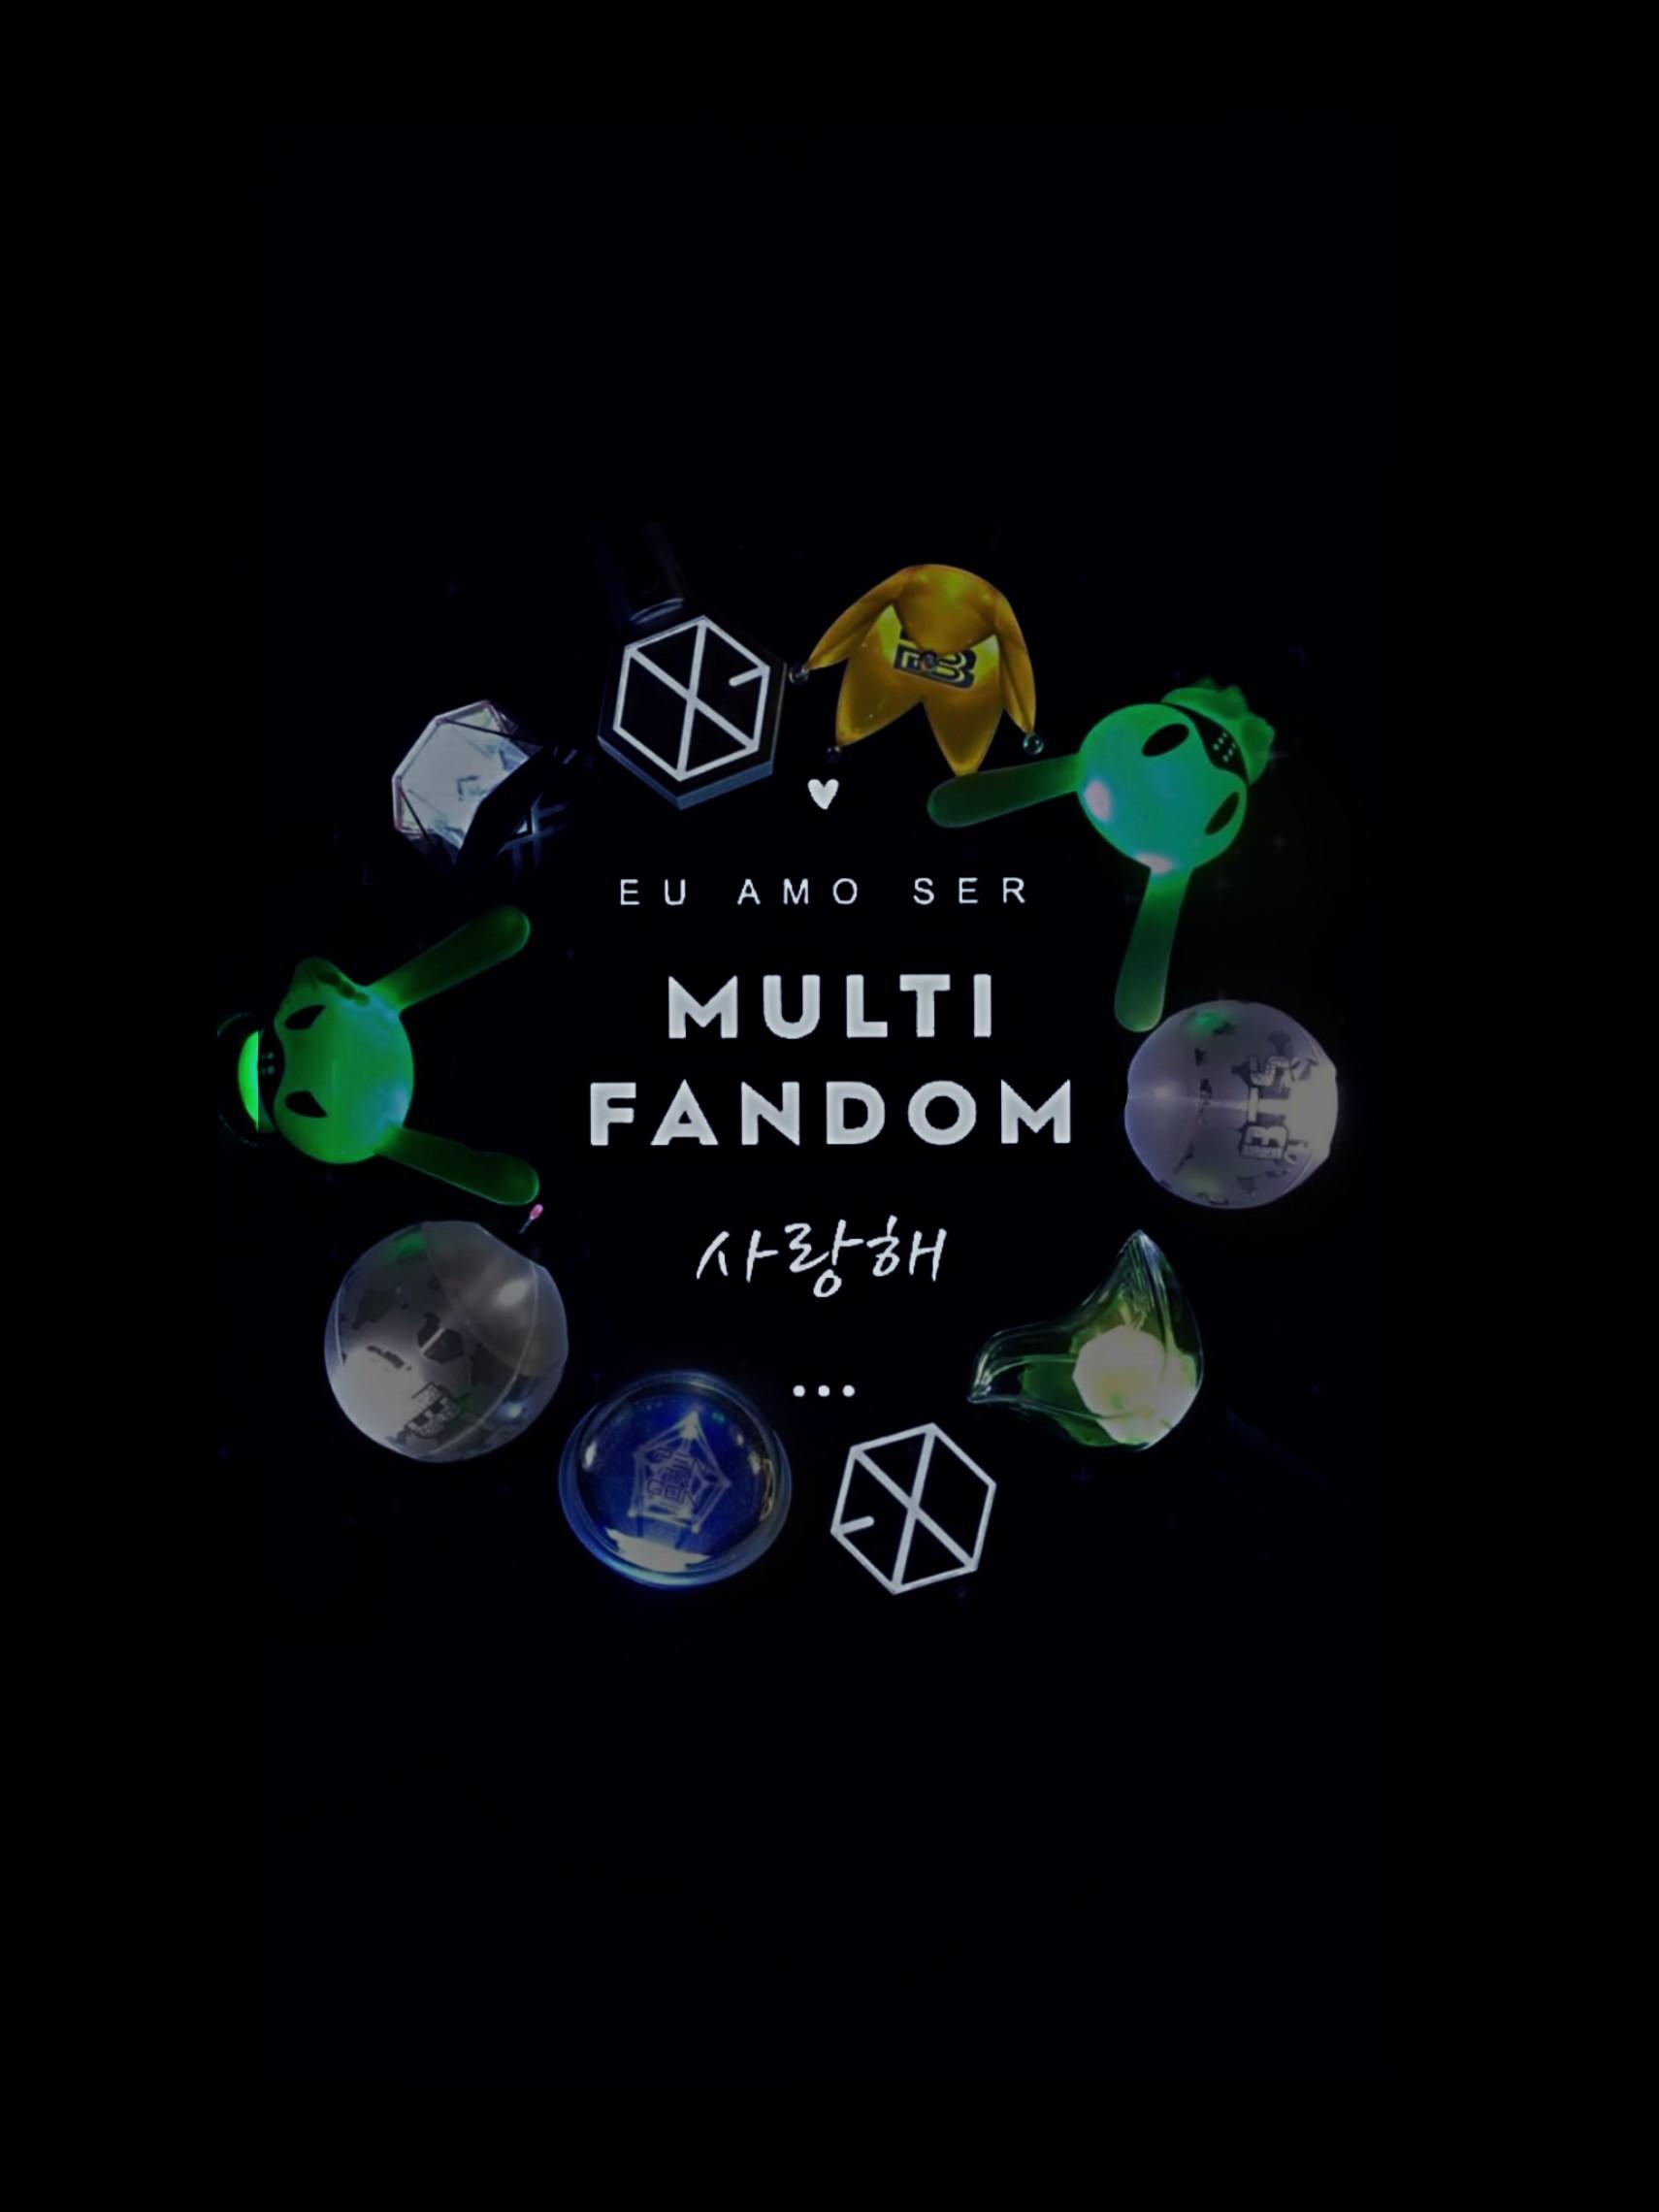 Freetoedit Kpop Multifandom Bigbang Exo Exo L Vip Bts